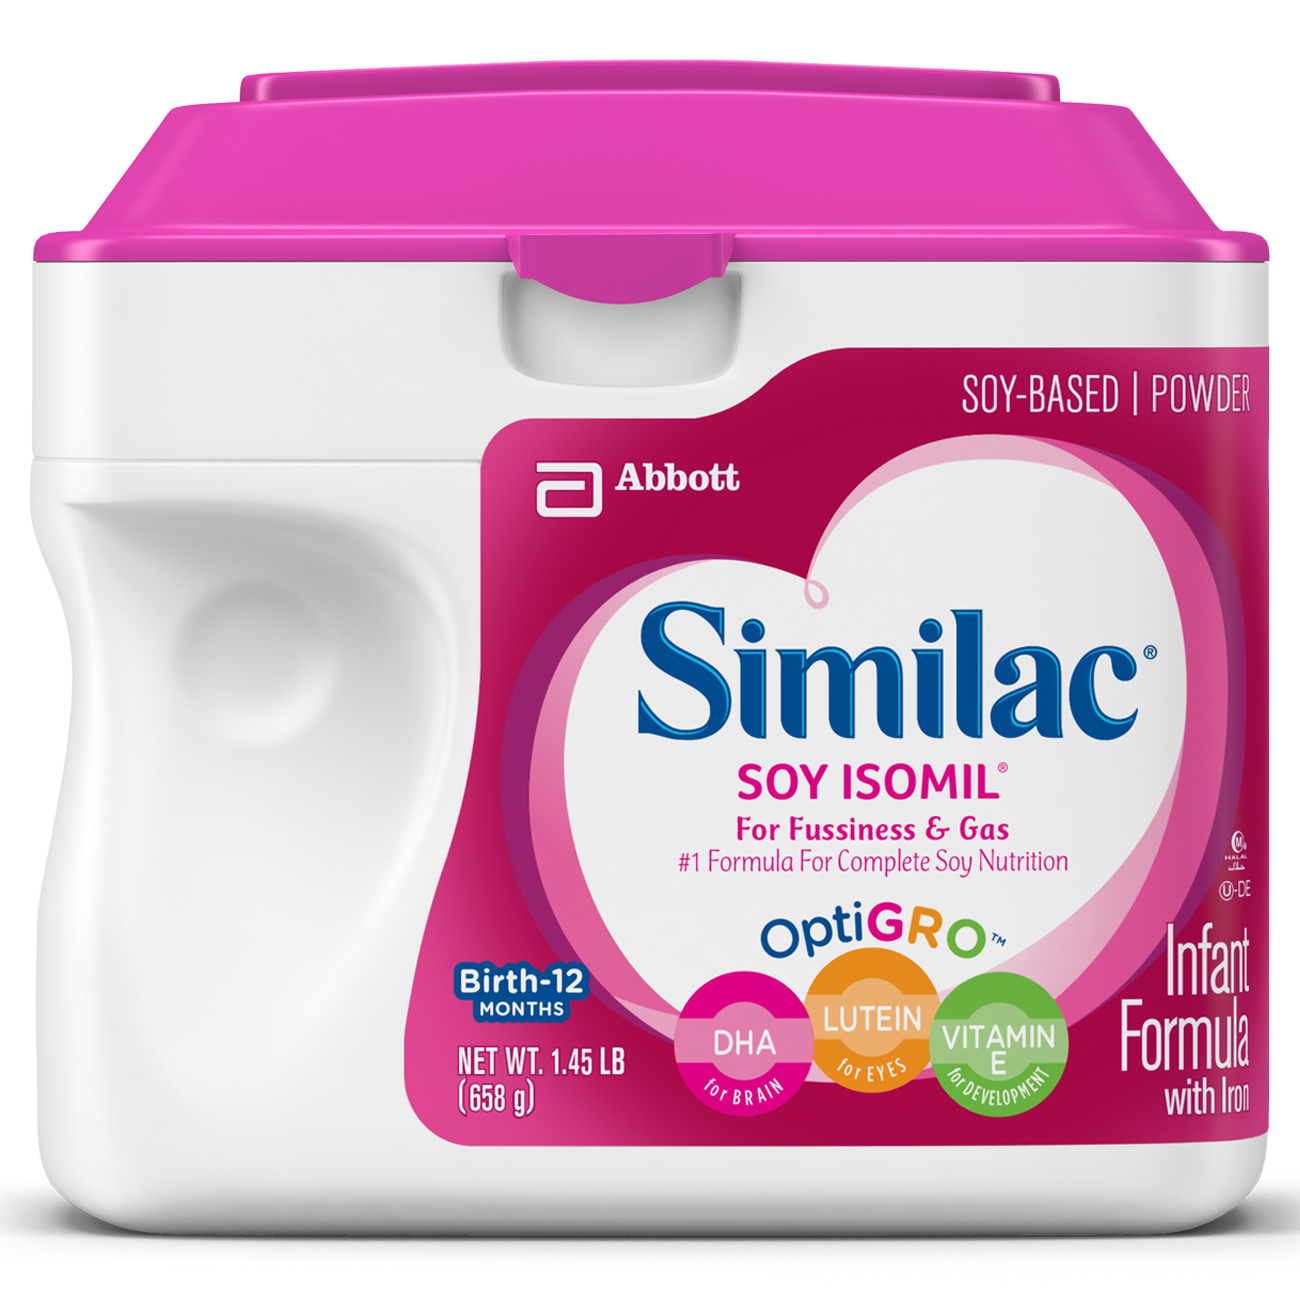 Similac Soy Isomil Infant Formula w/ Iron (Pack of 6) Powder 1.45 lb